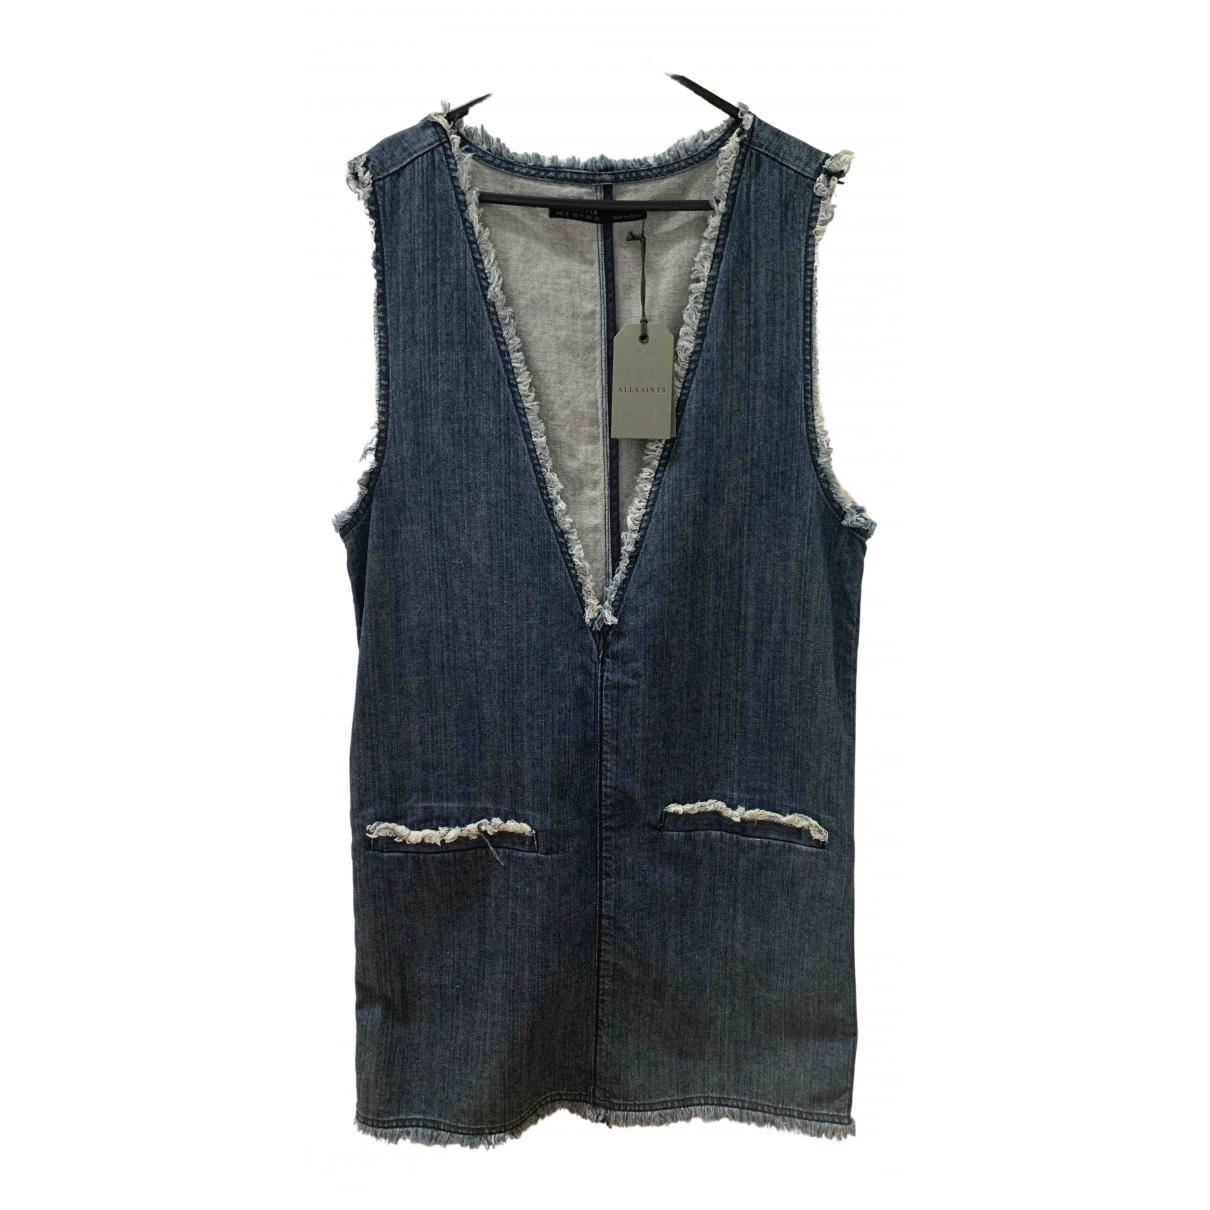 All Saints N Blue Denim - Jeans dress for Women 8 UK